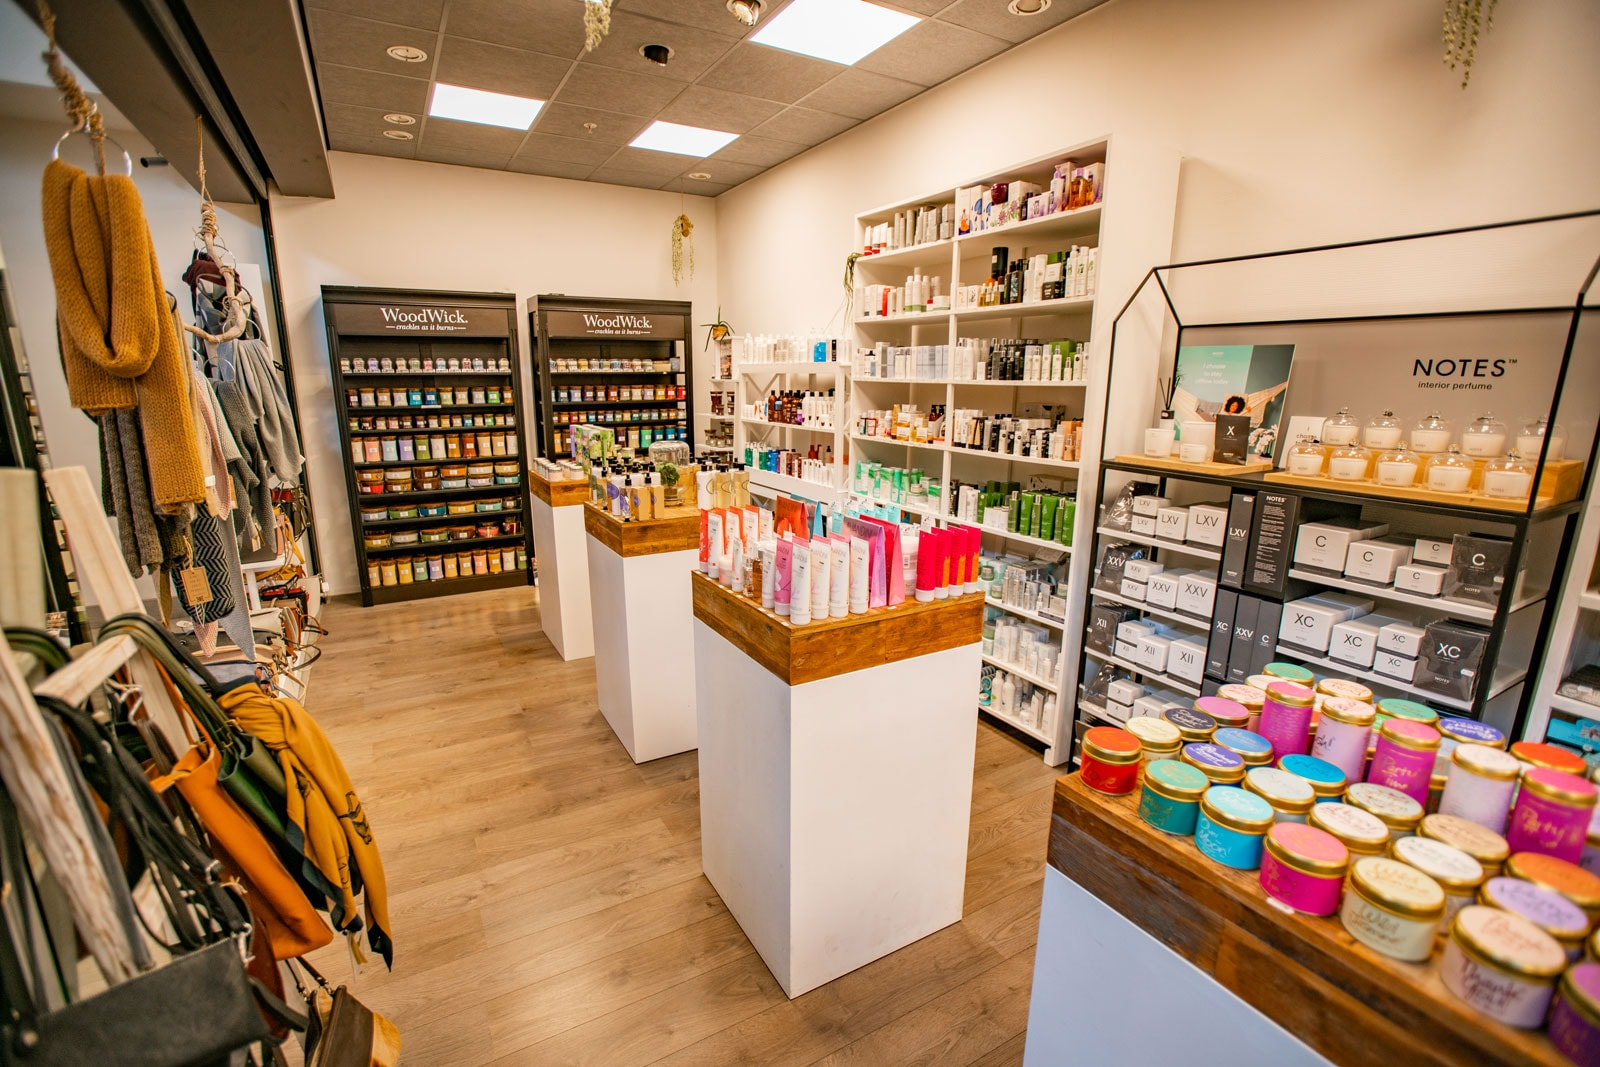 Organic Winkelcentrum Organic Baboba Winkelcentrum Luxury Baboba Luxury Midas Midas dBsCthQrx